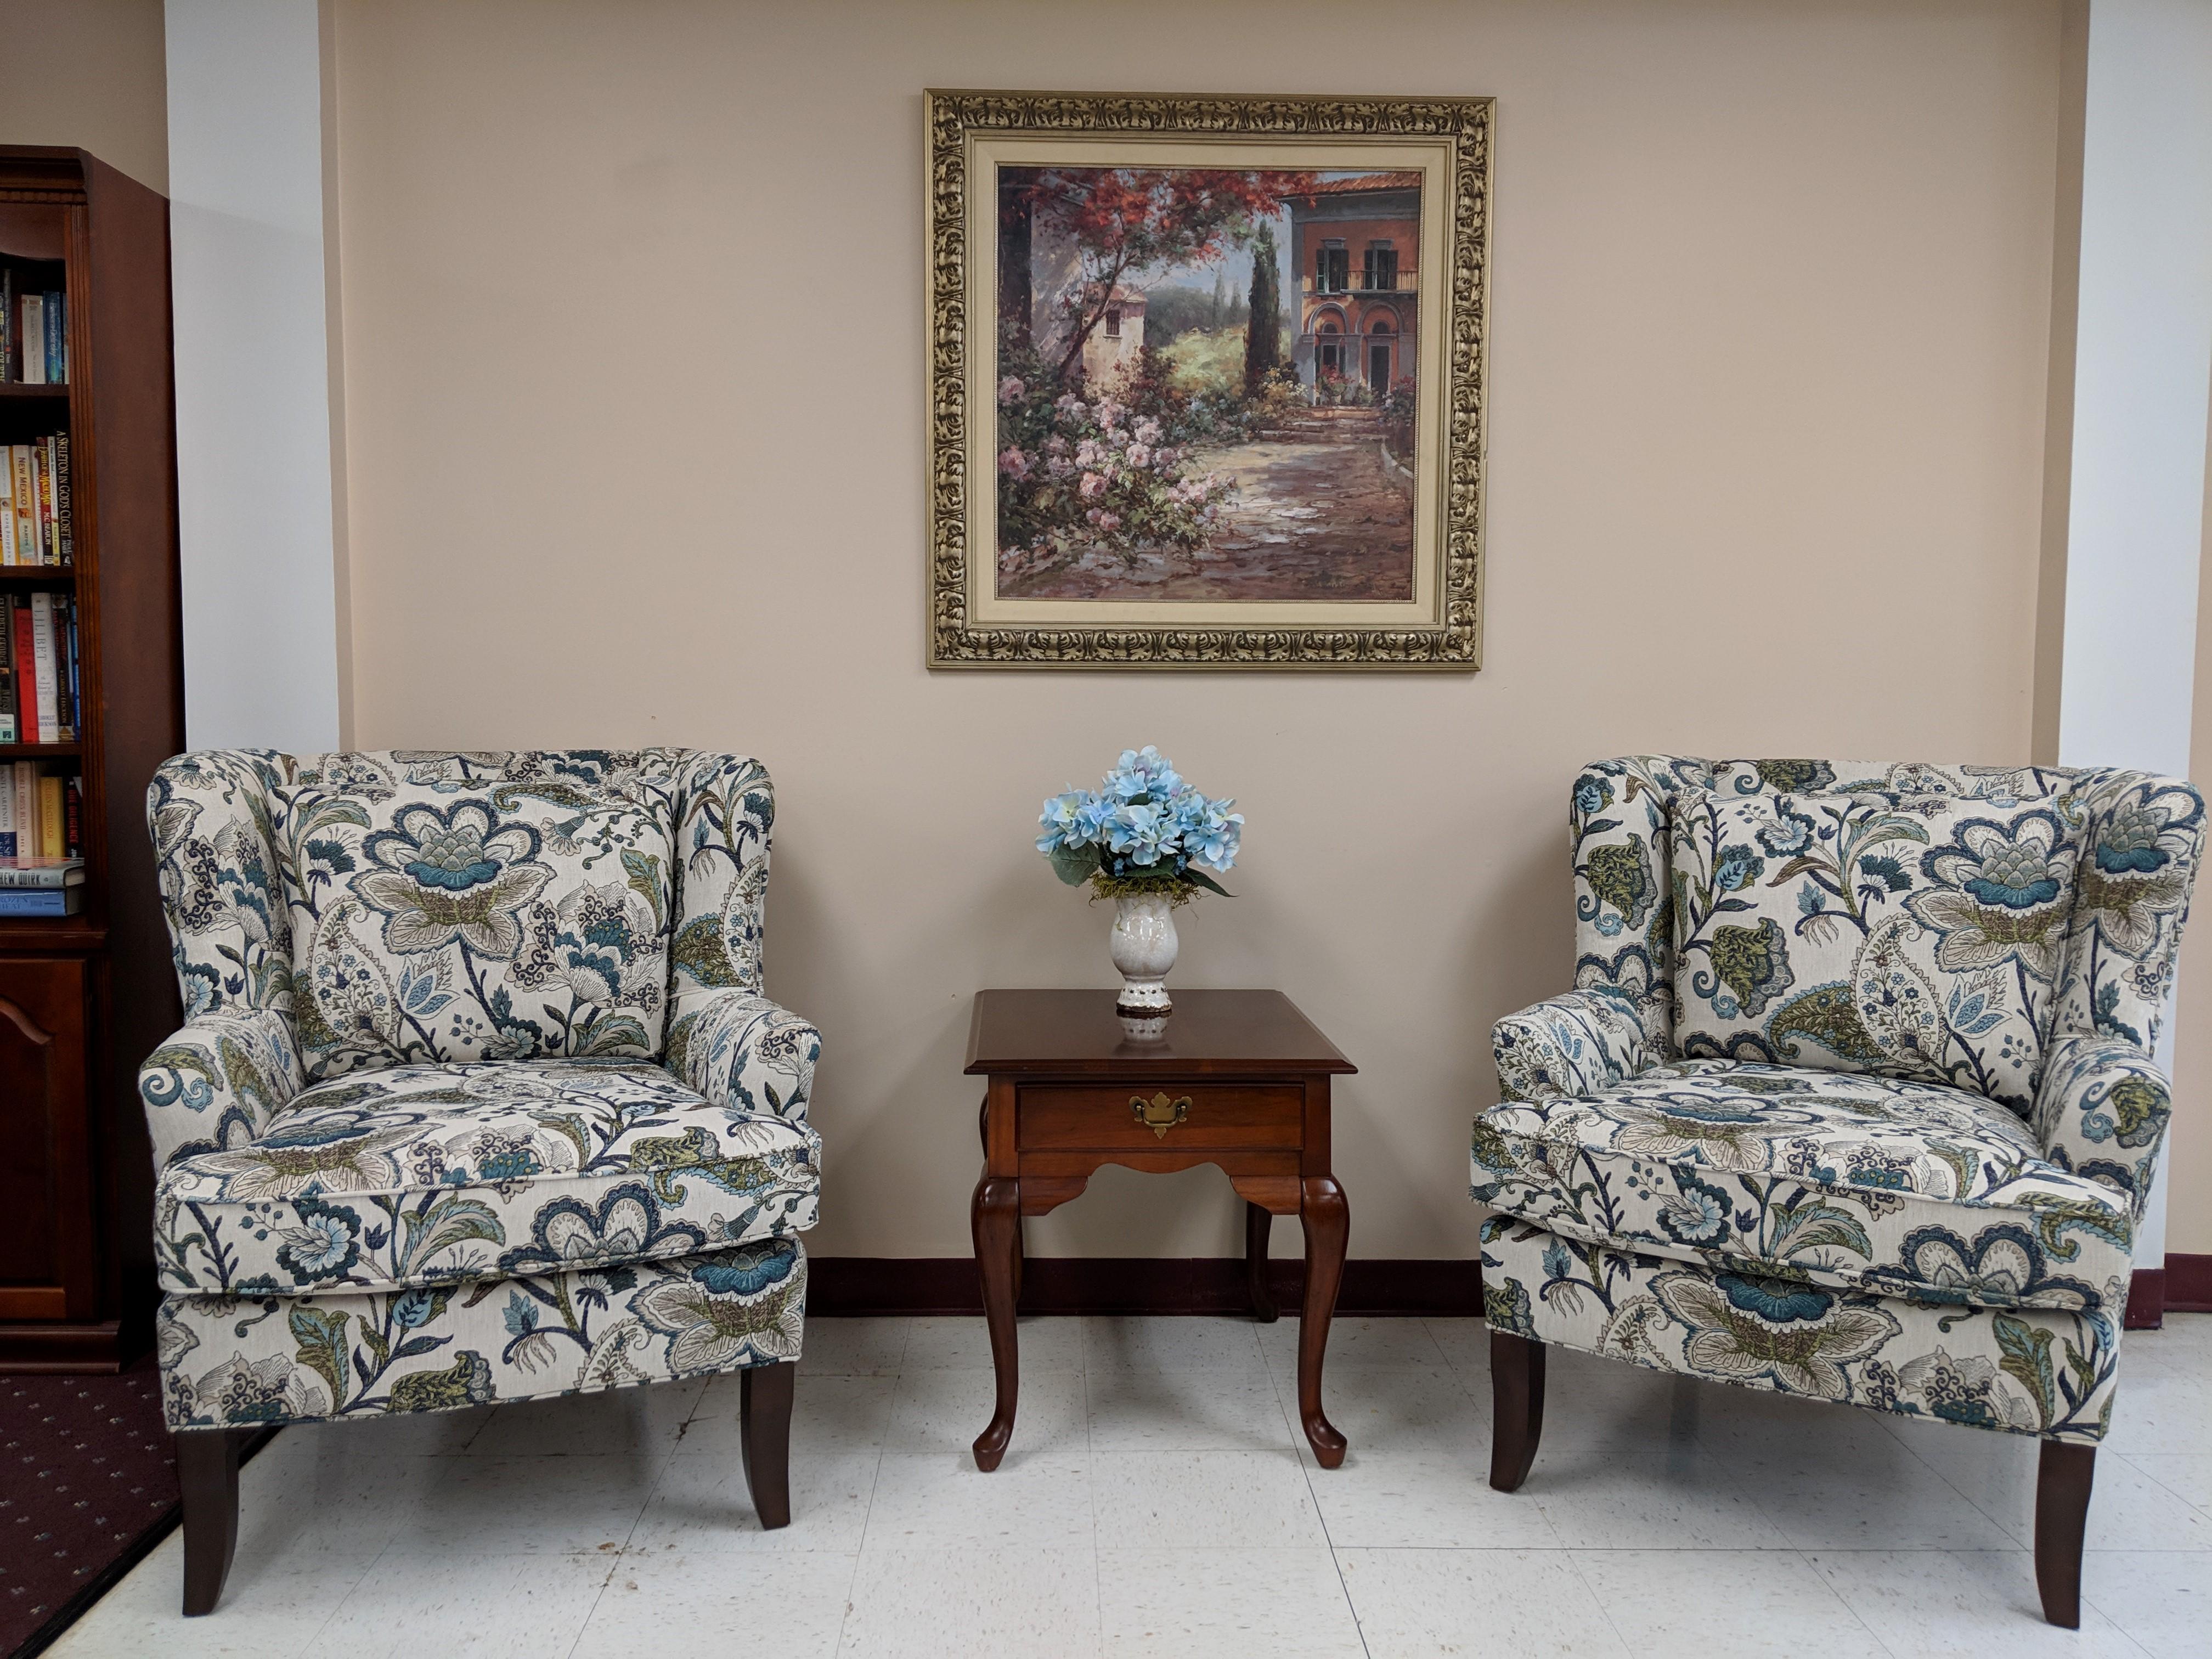 Community Room seating